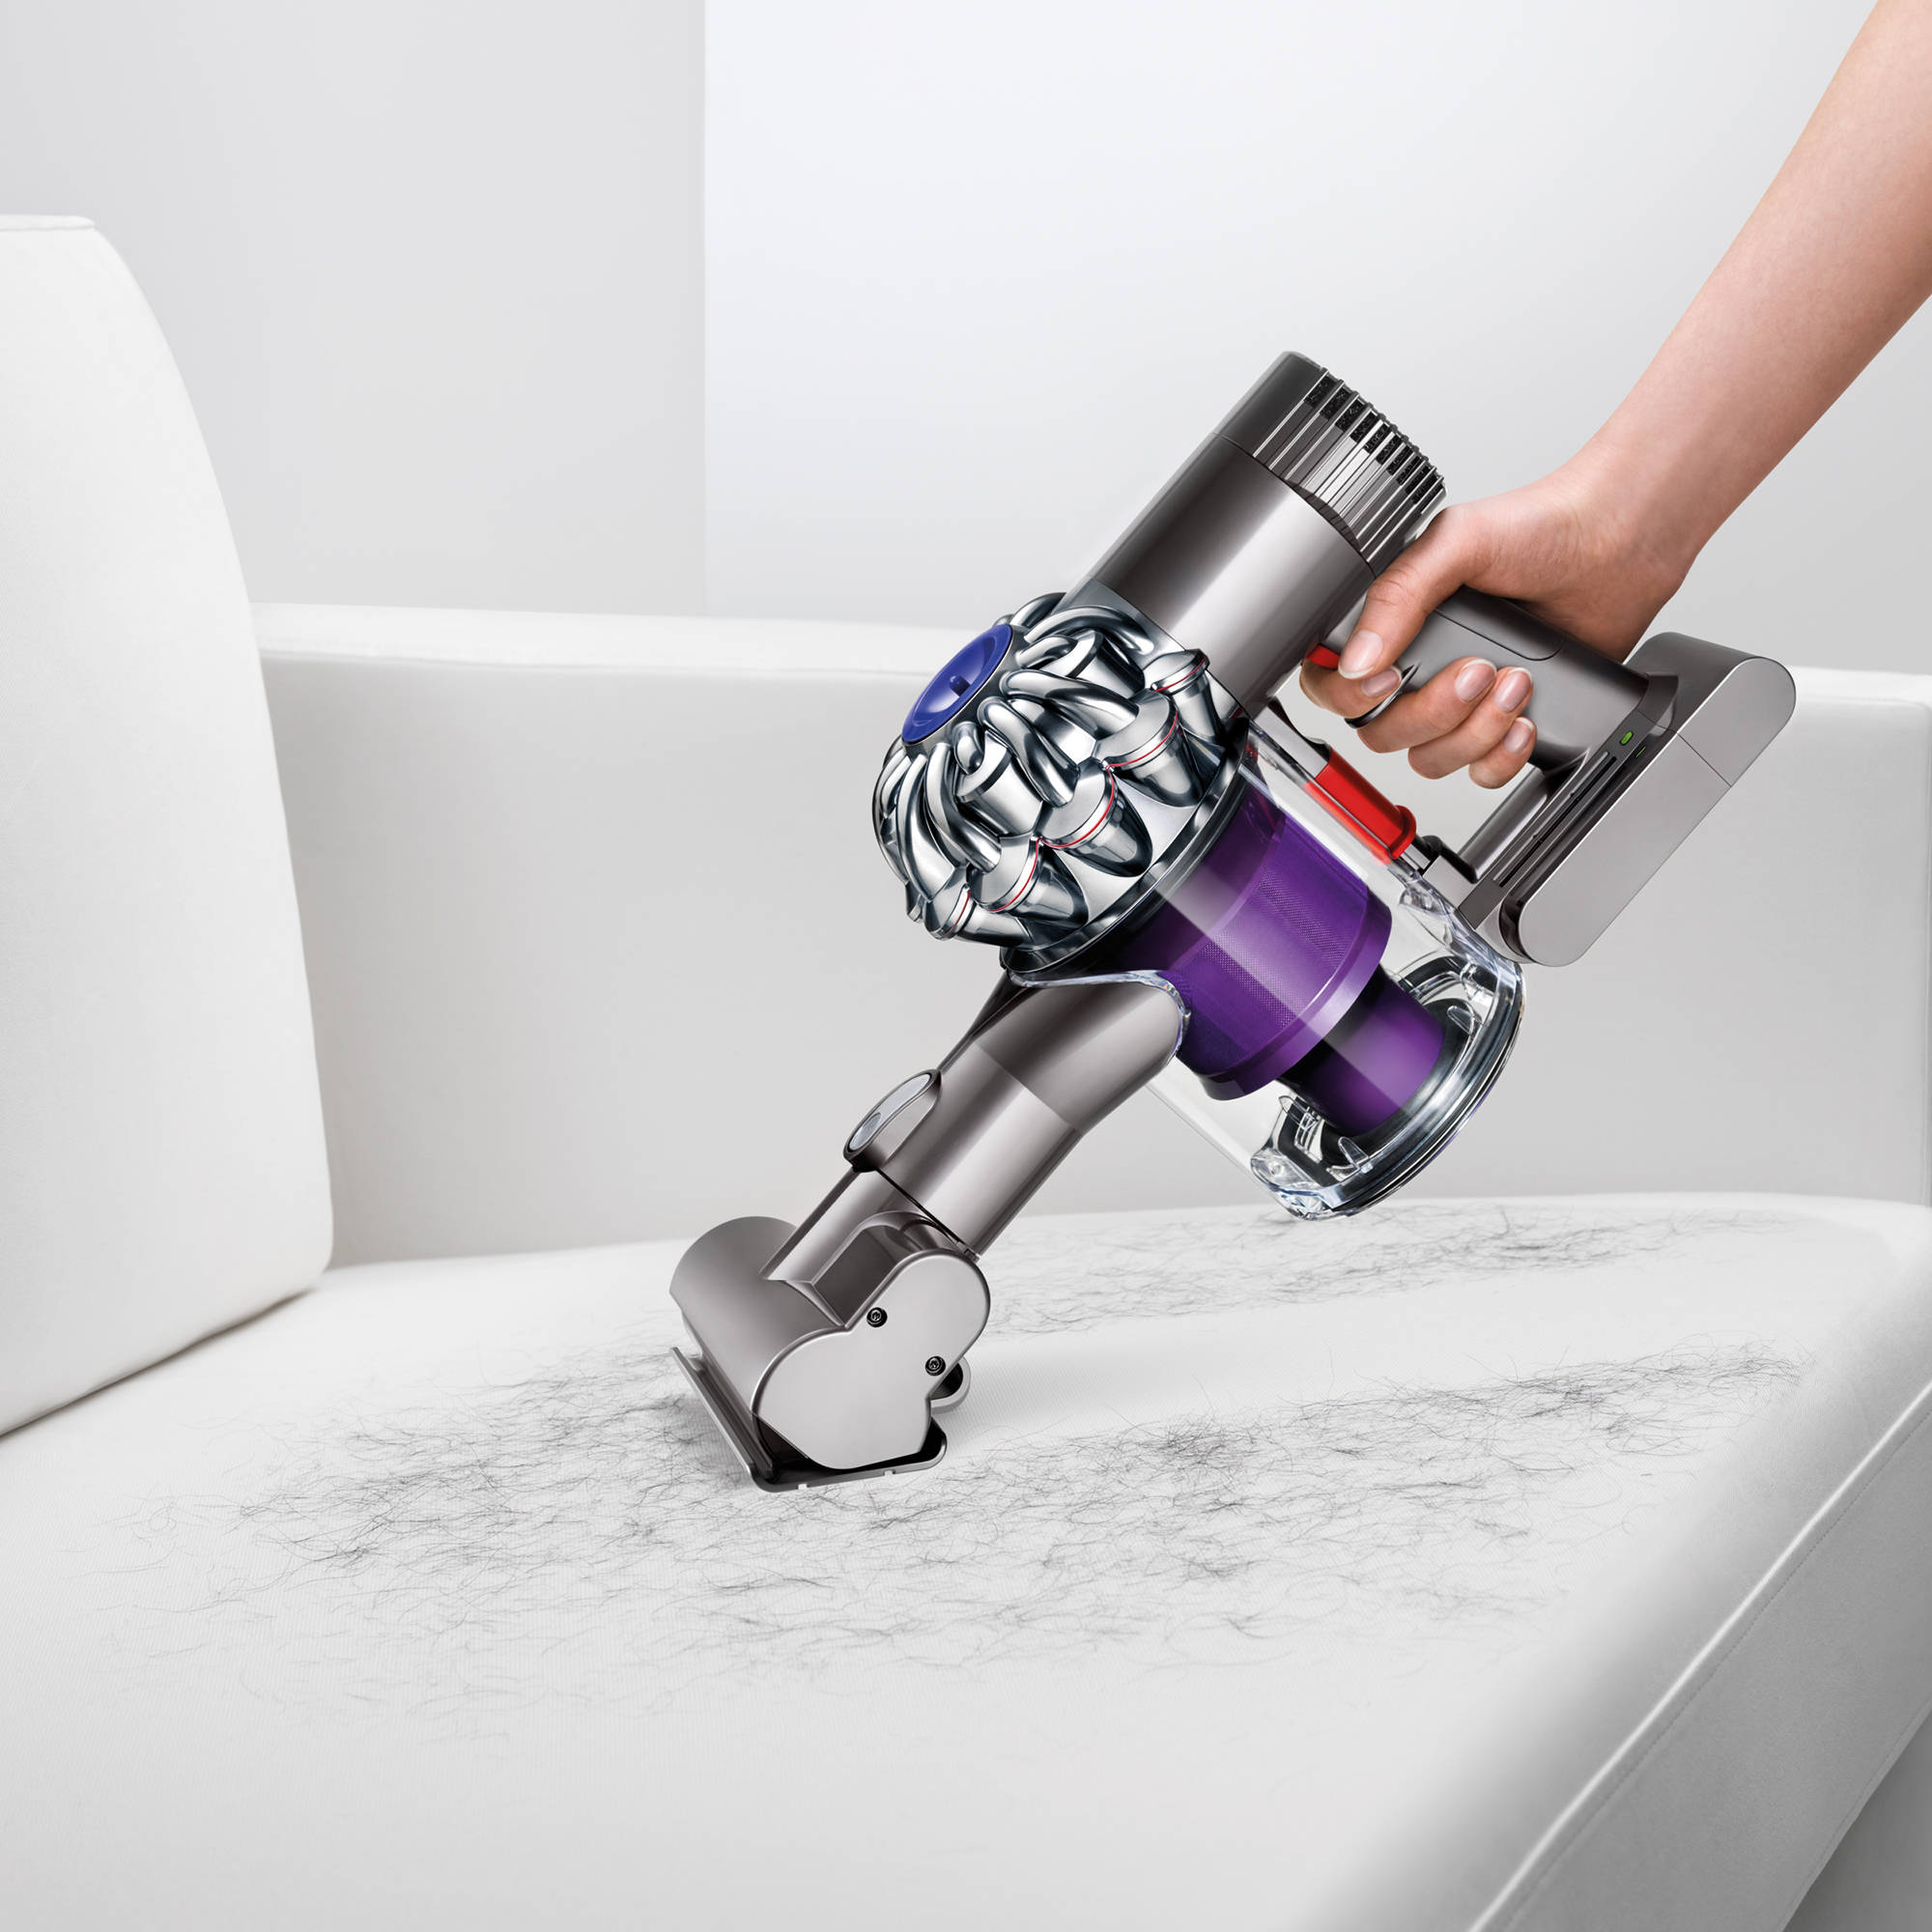 Captivating Dyson V6 Animal Cordless Vacuum, 210692 01   Walmart.com